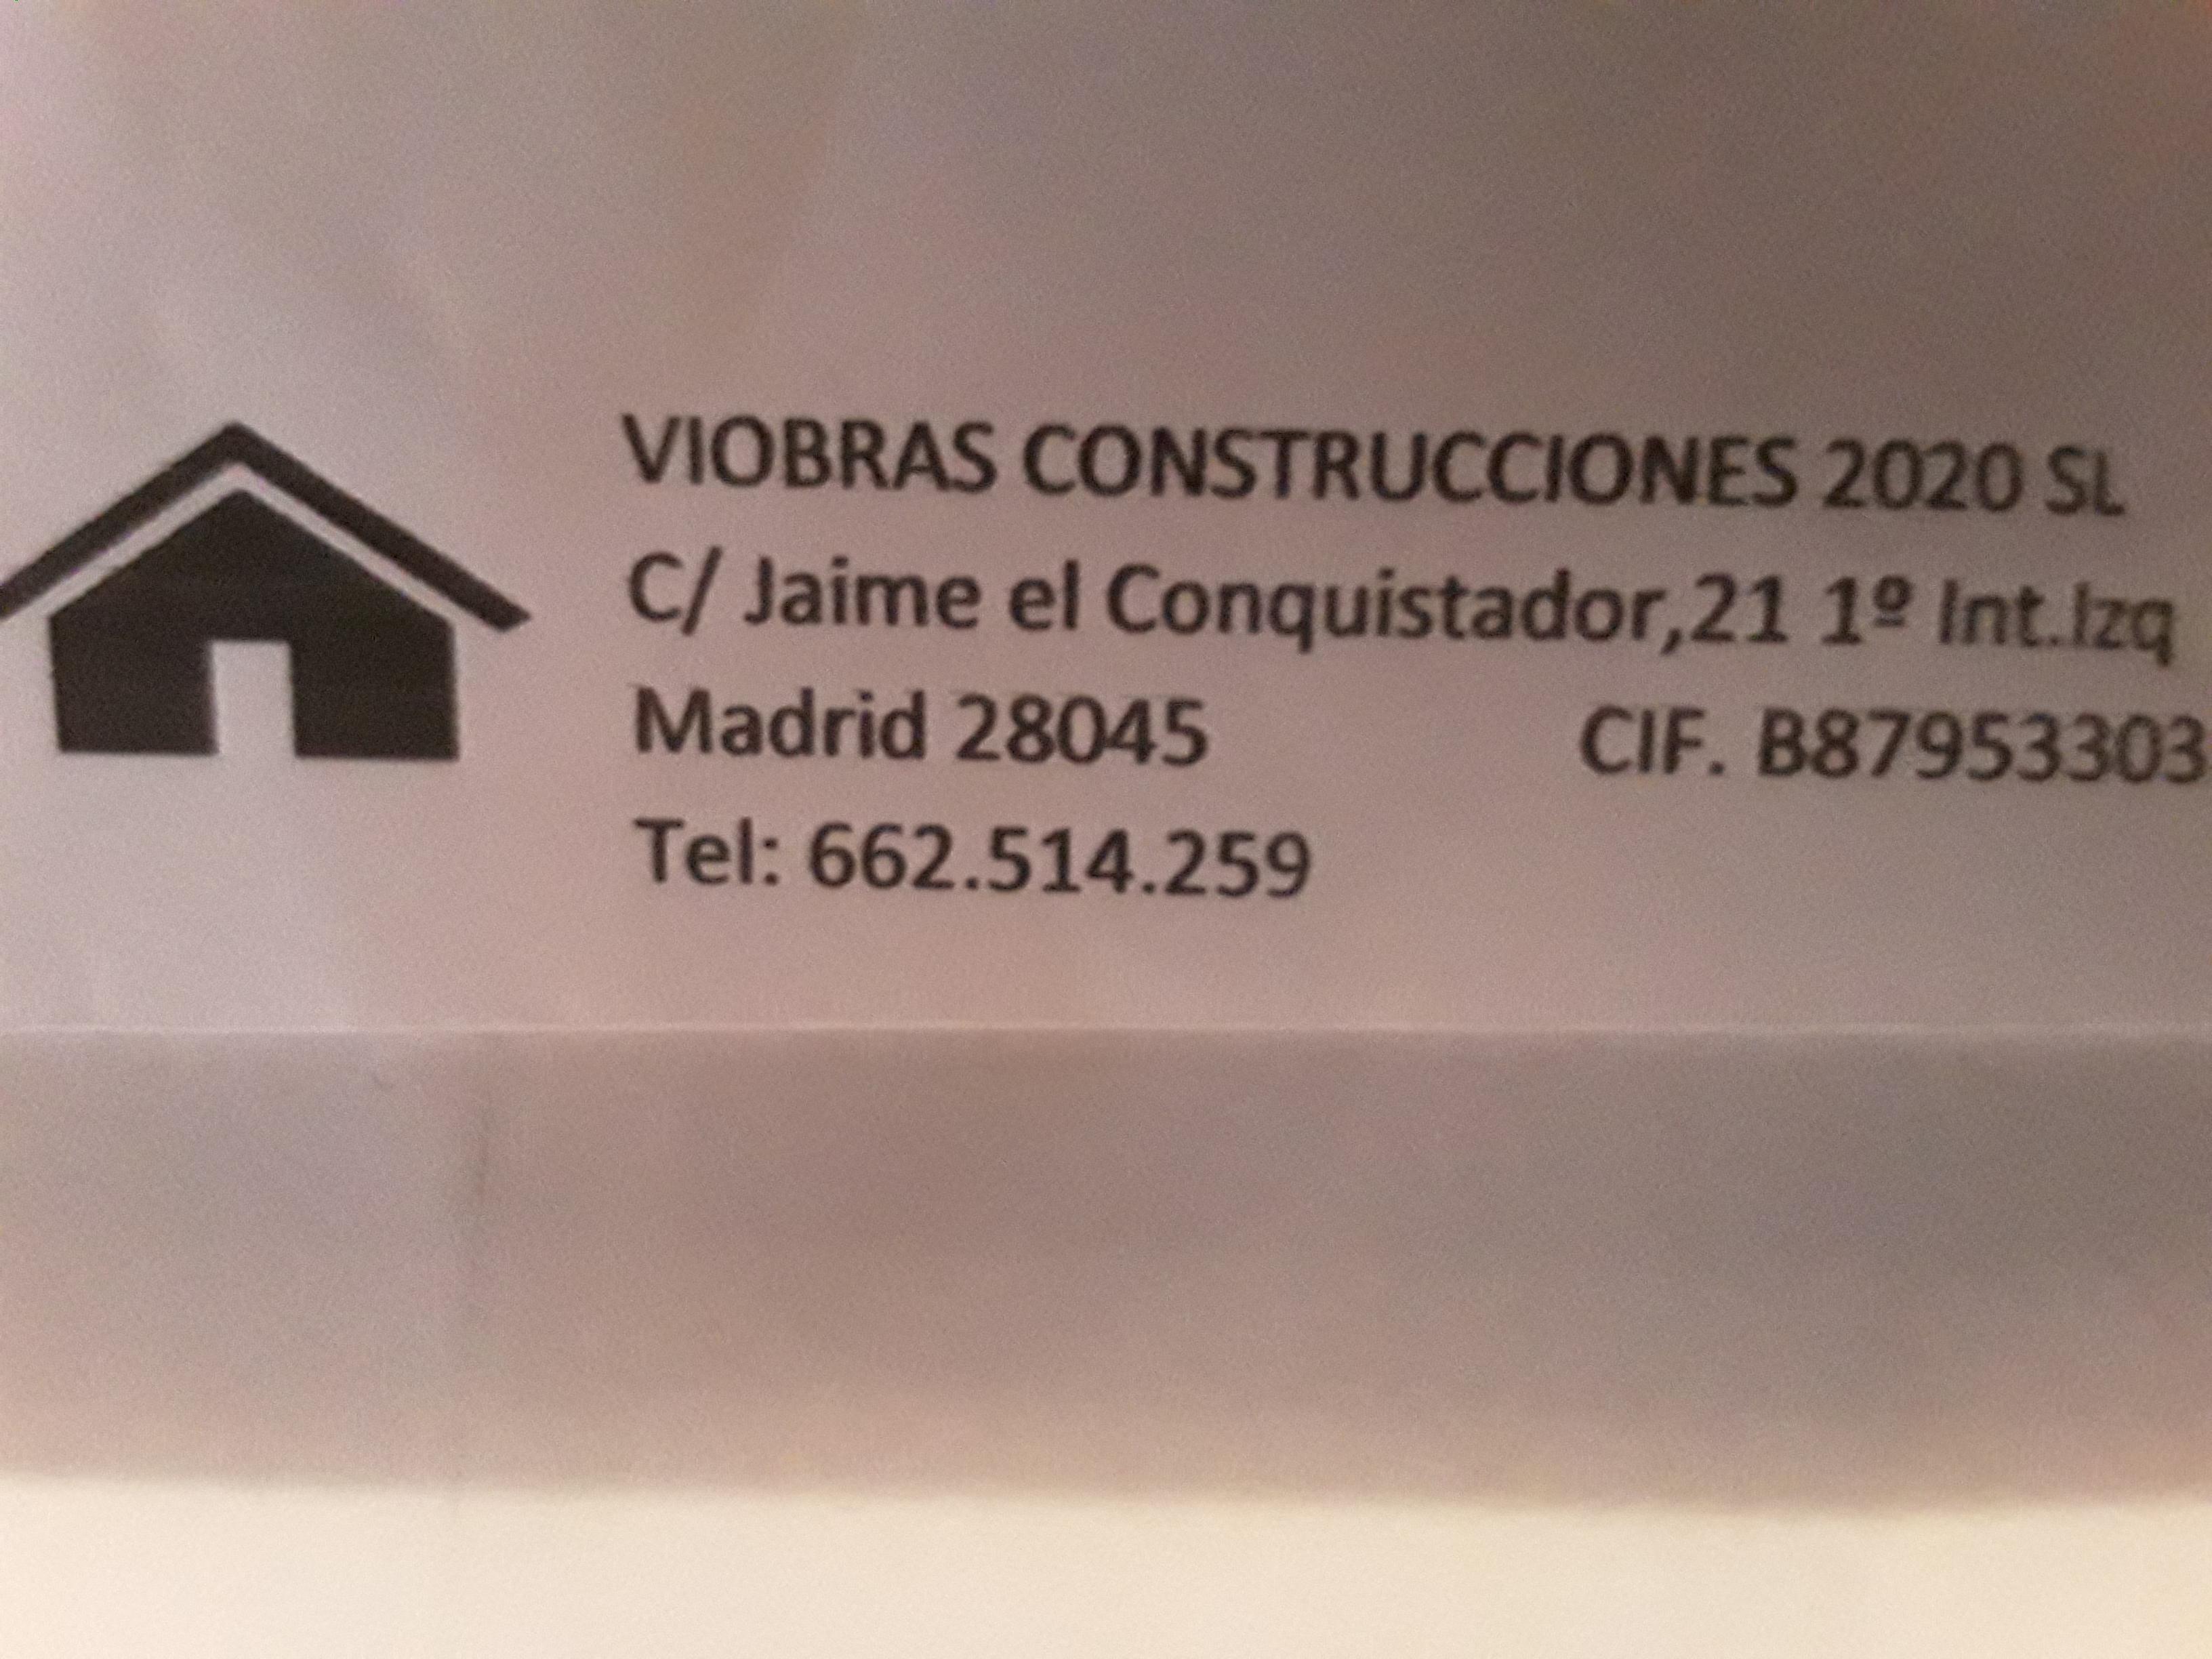 Viobras contrucciones 2020 s.l